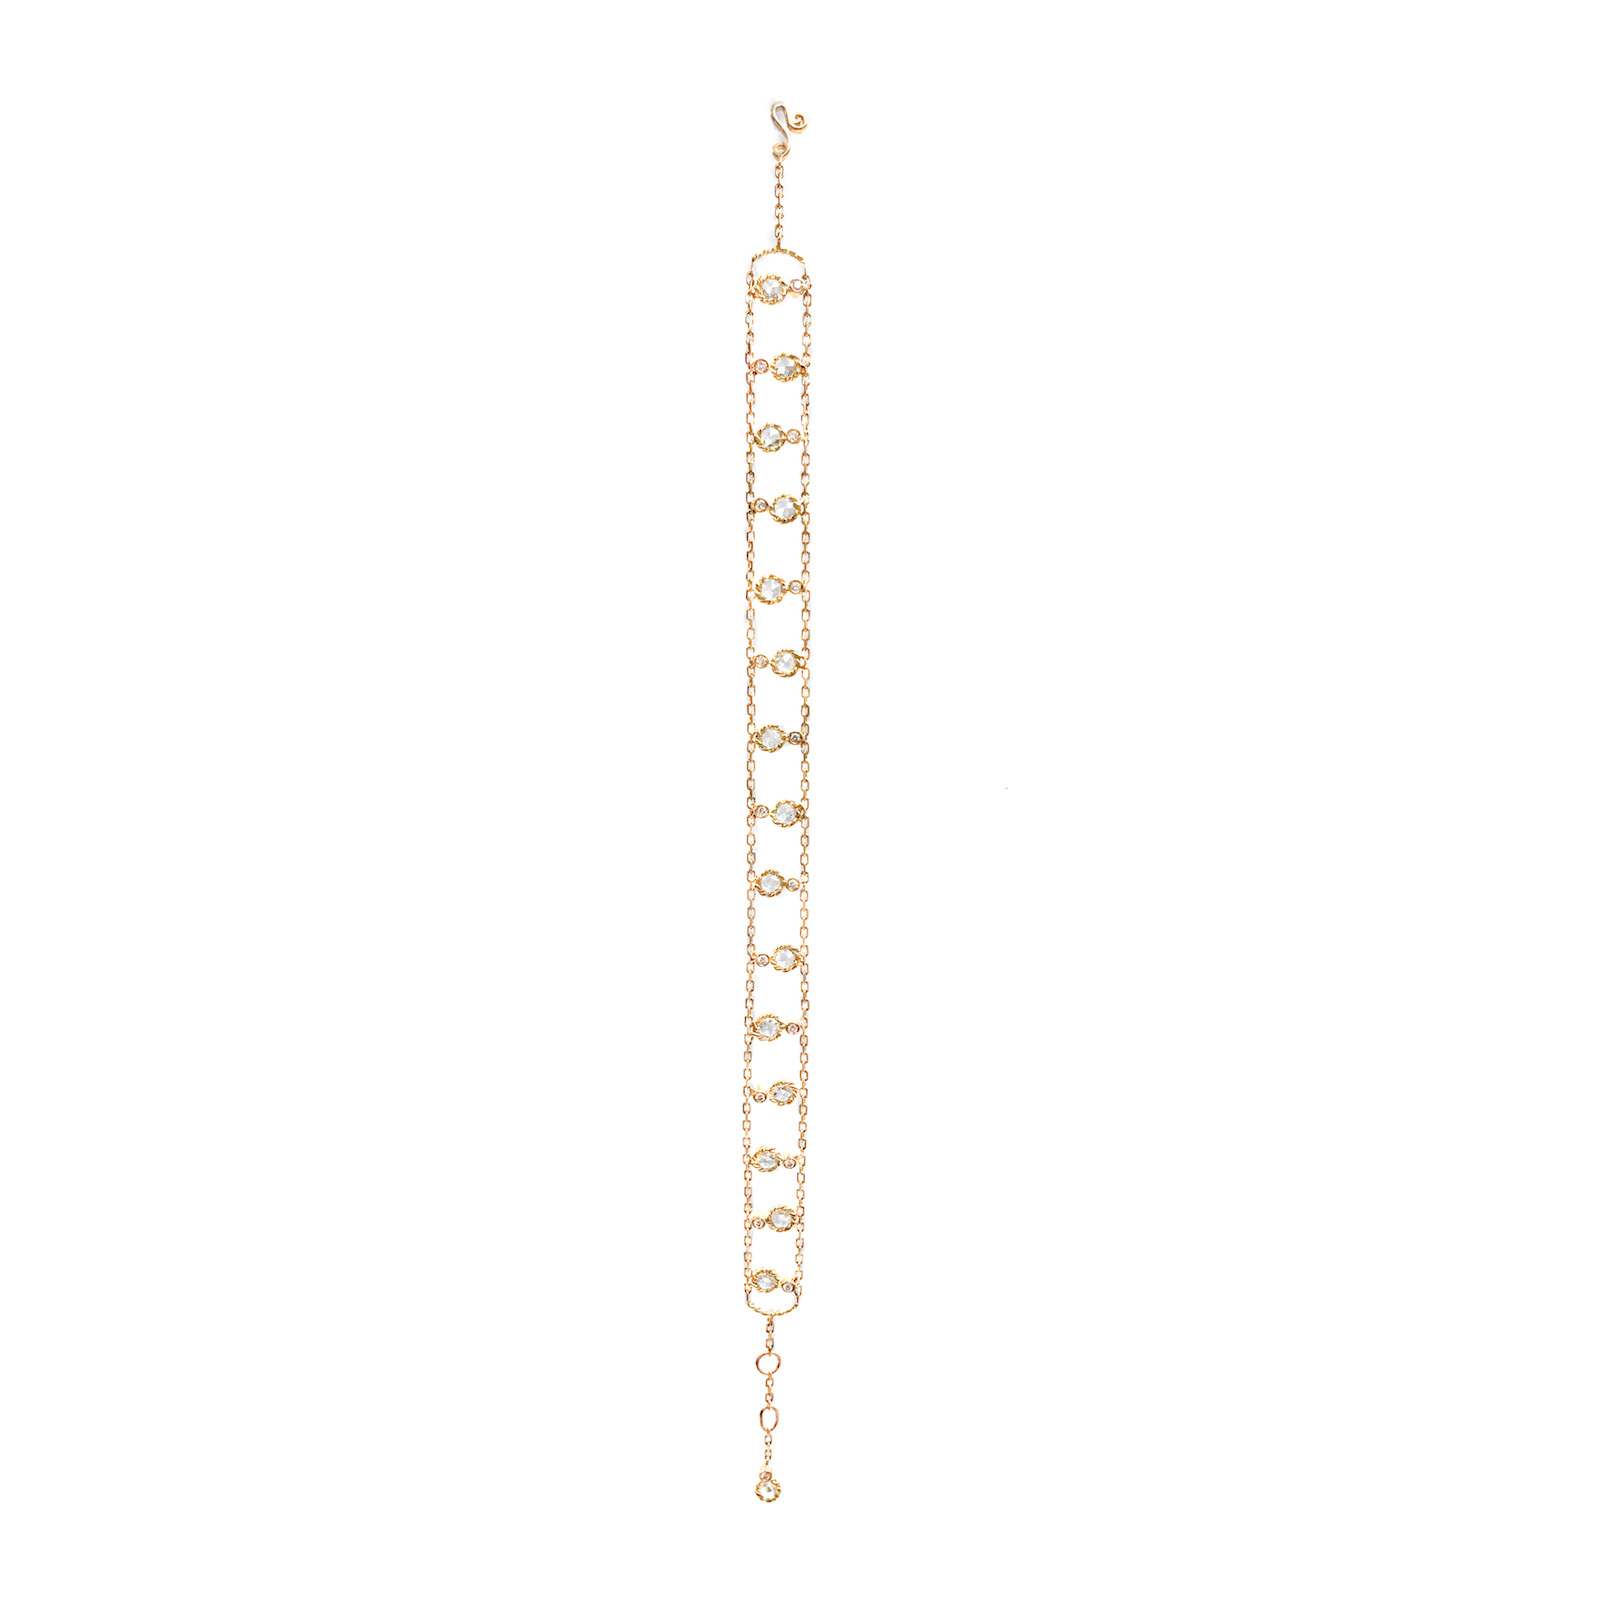 105-Alternate-Twist-Bezel-Rose-Cut-Diamond-Gold-Station-Chain-Bracelet-14k-18k-JeweLyrie-_7692